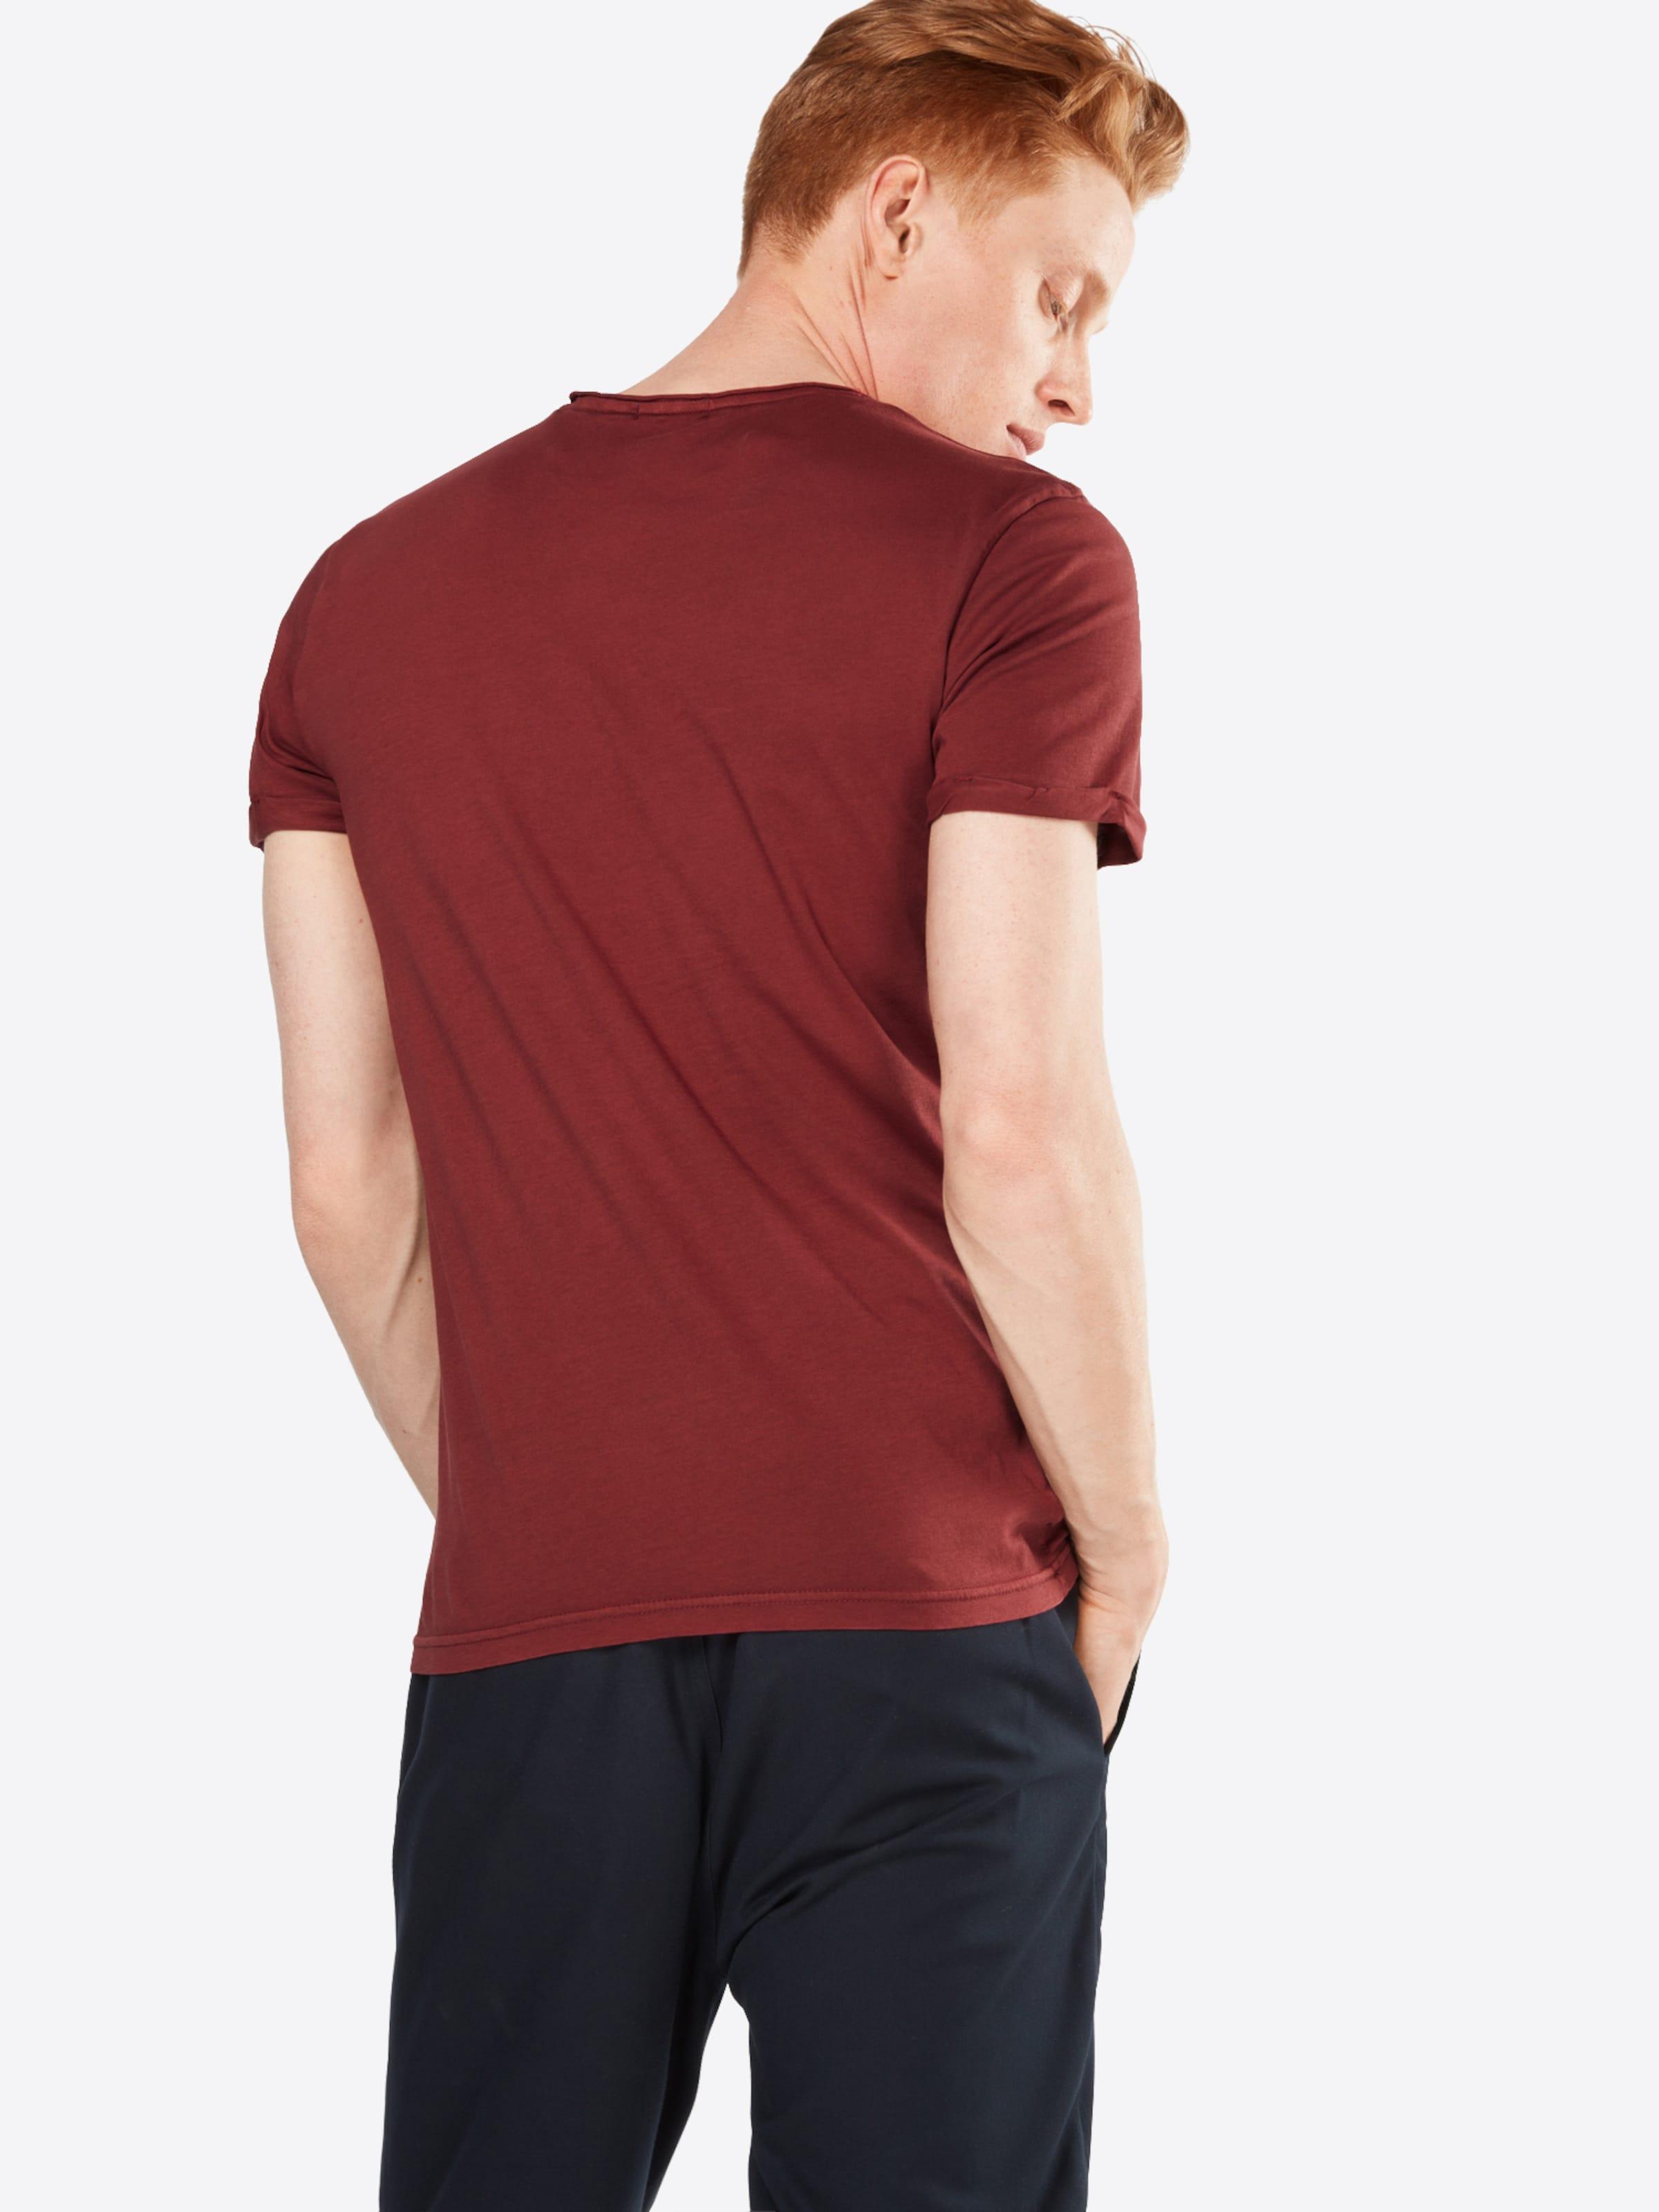 T Tom Tailor En Rouille Rouge shirt QCBWoerdx